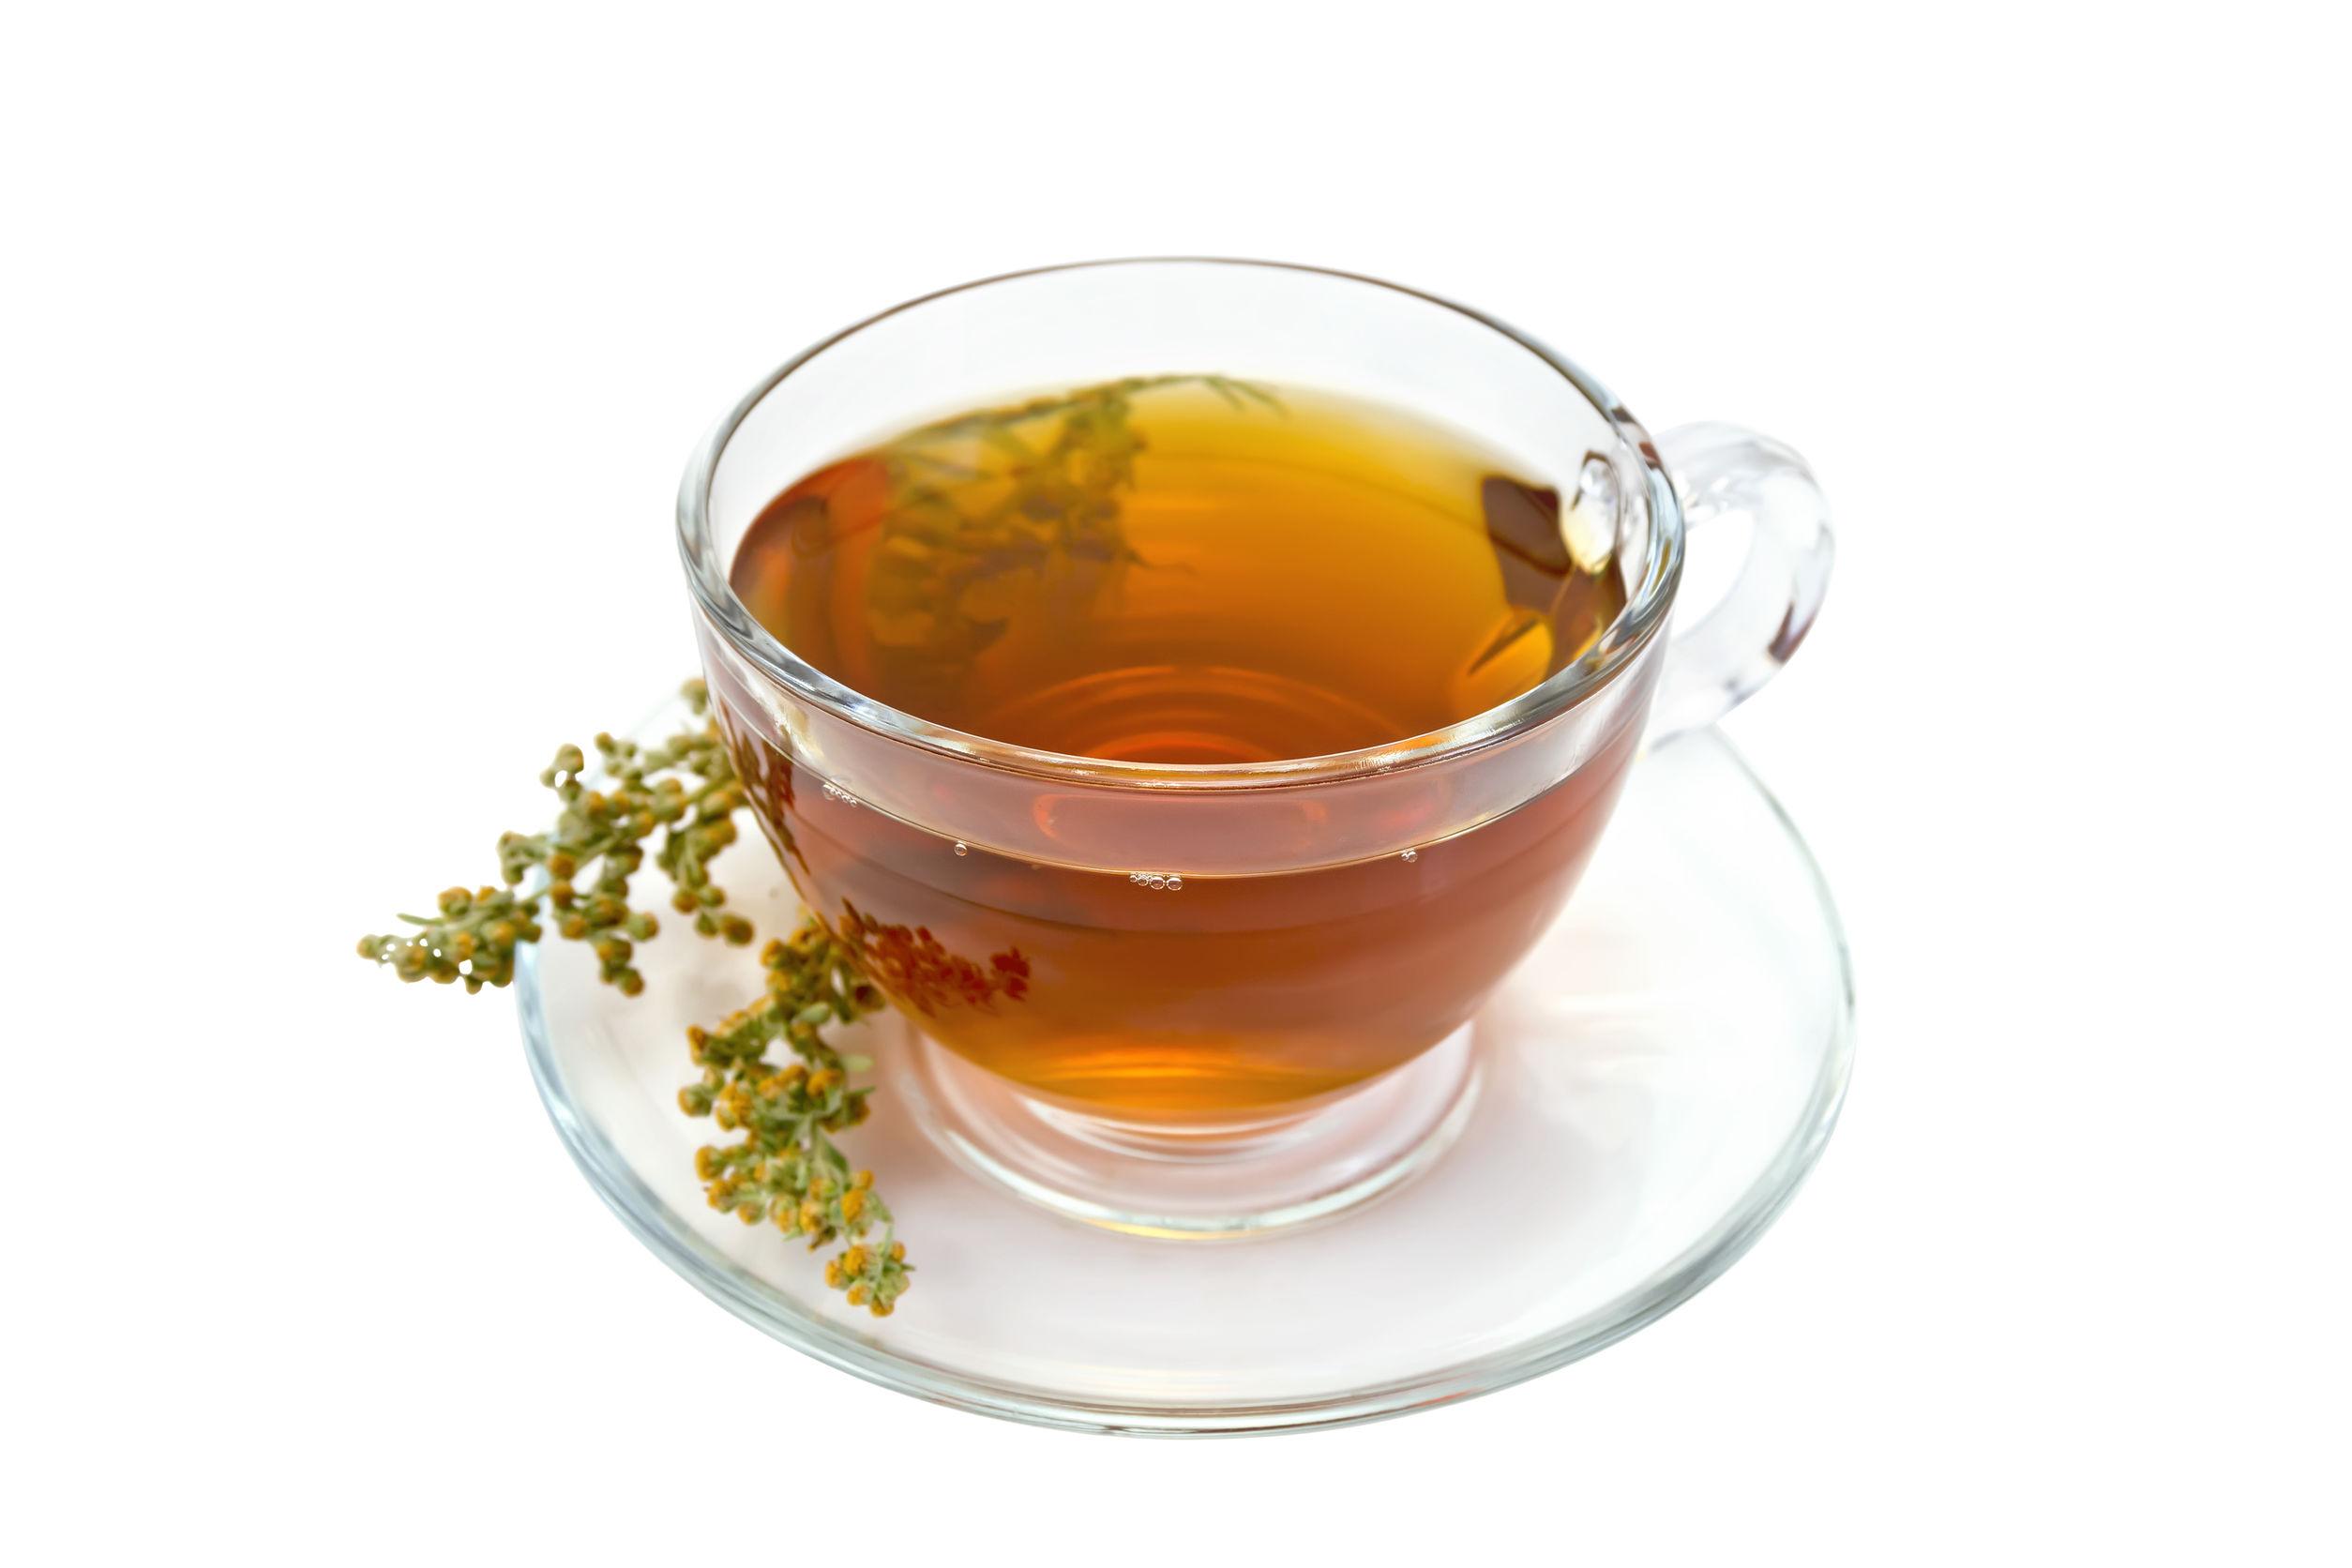 Study: Wormwood Tea Effective at Treating Schistosomiasis ...